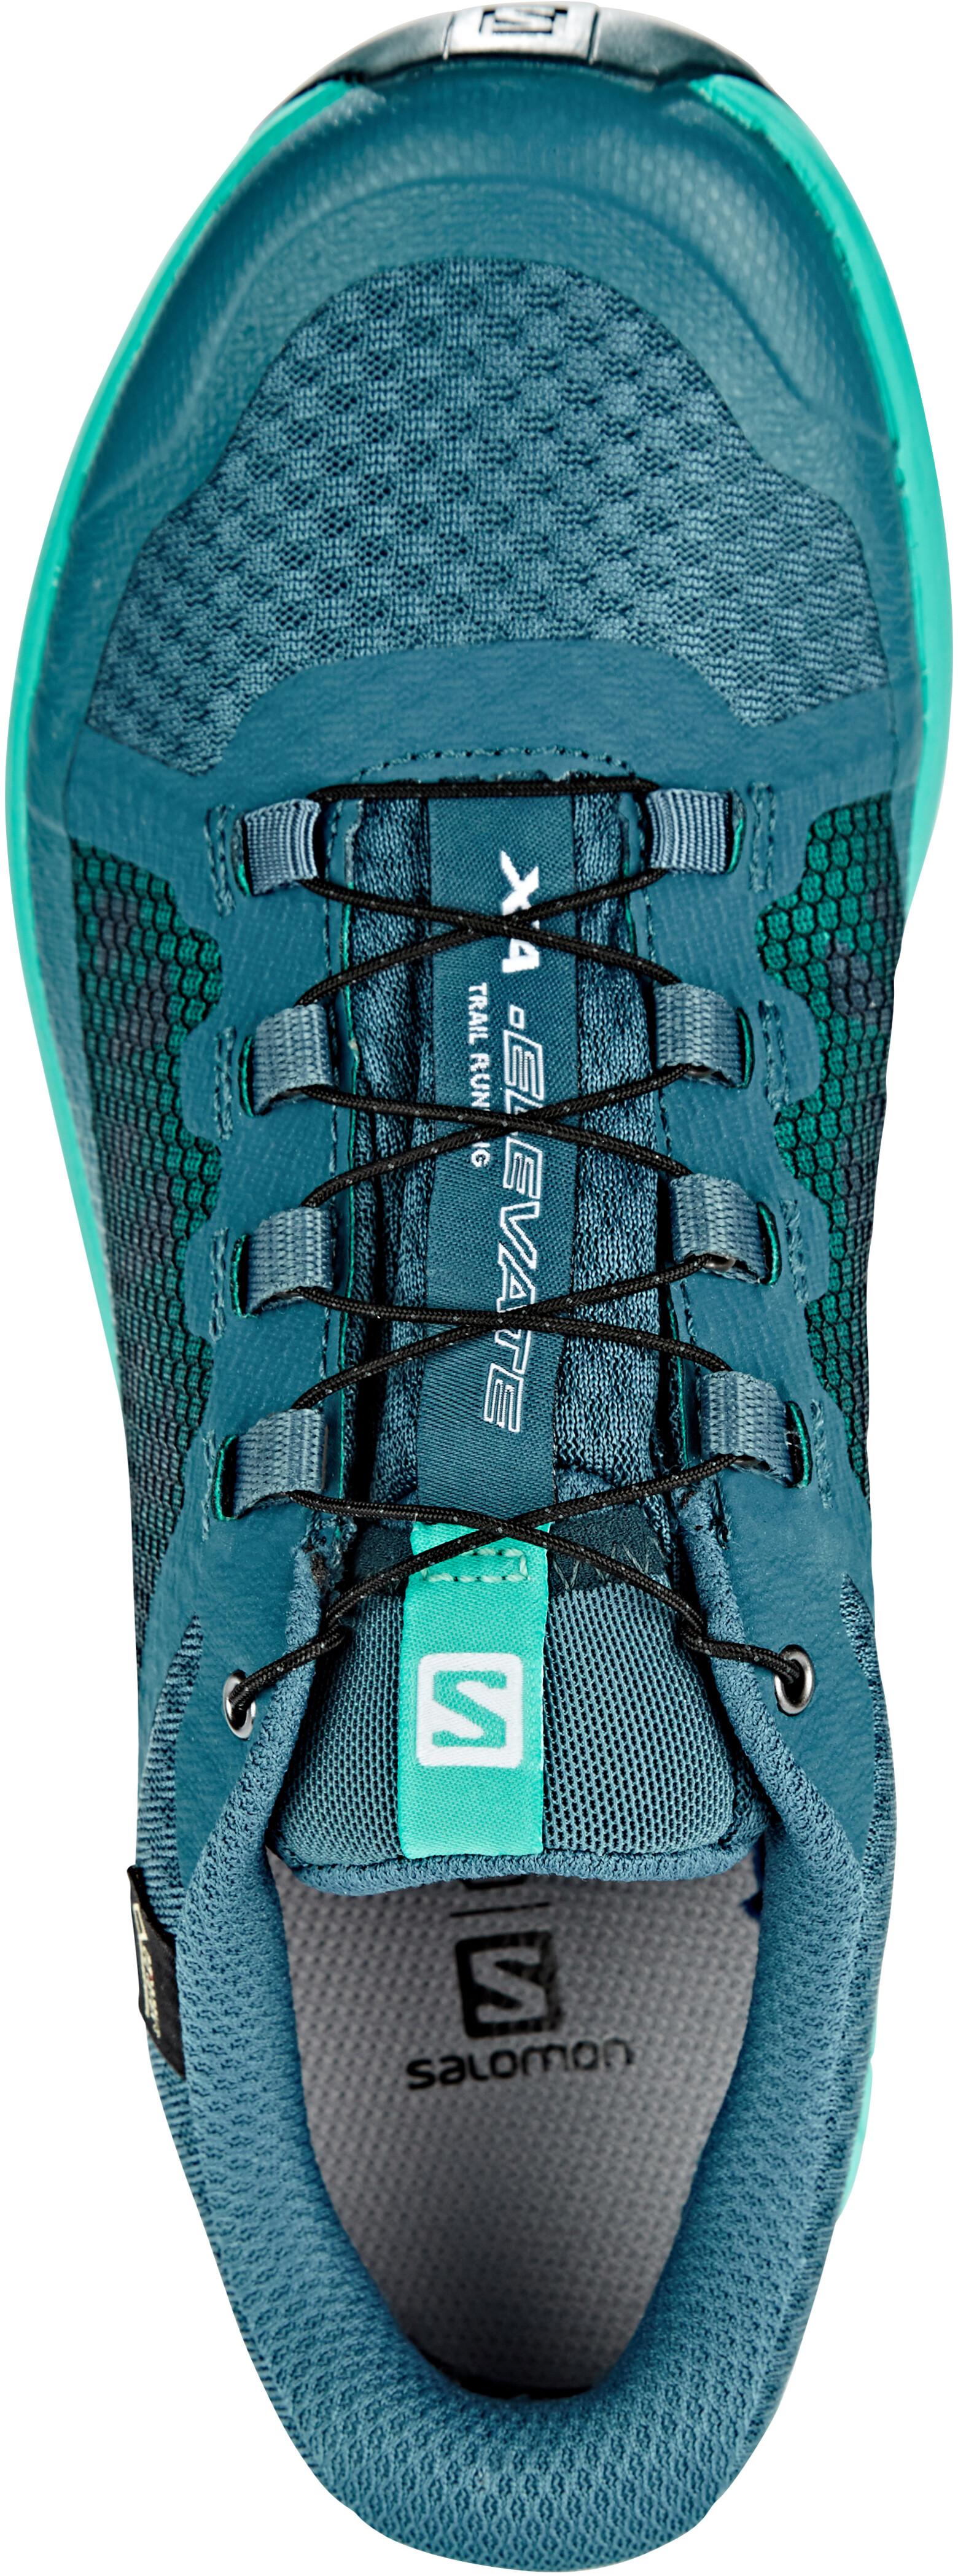 d698840e6a94 Salomon XA Elevate GTX Shoes Women mallard blue atlantis reflecting pond